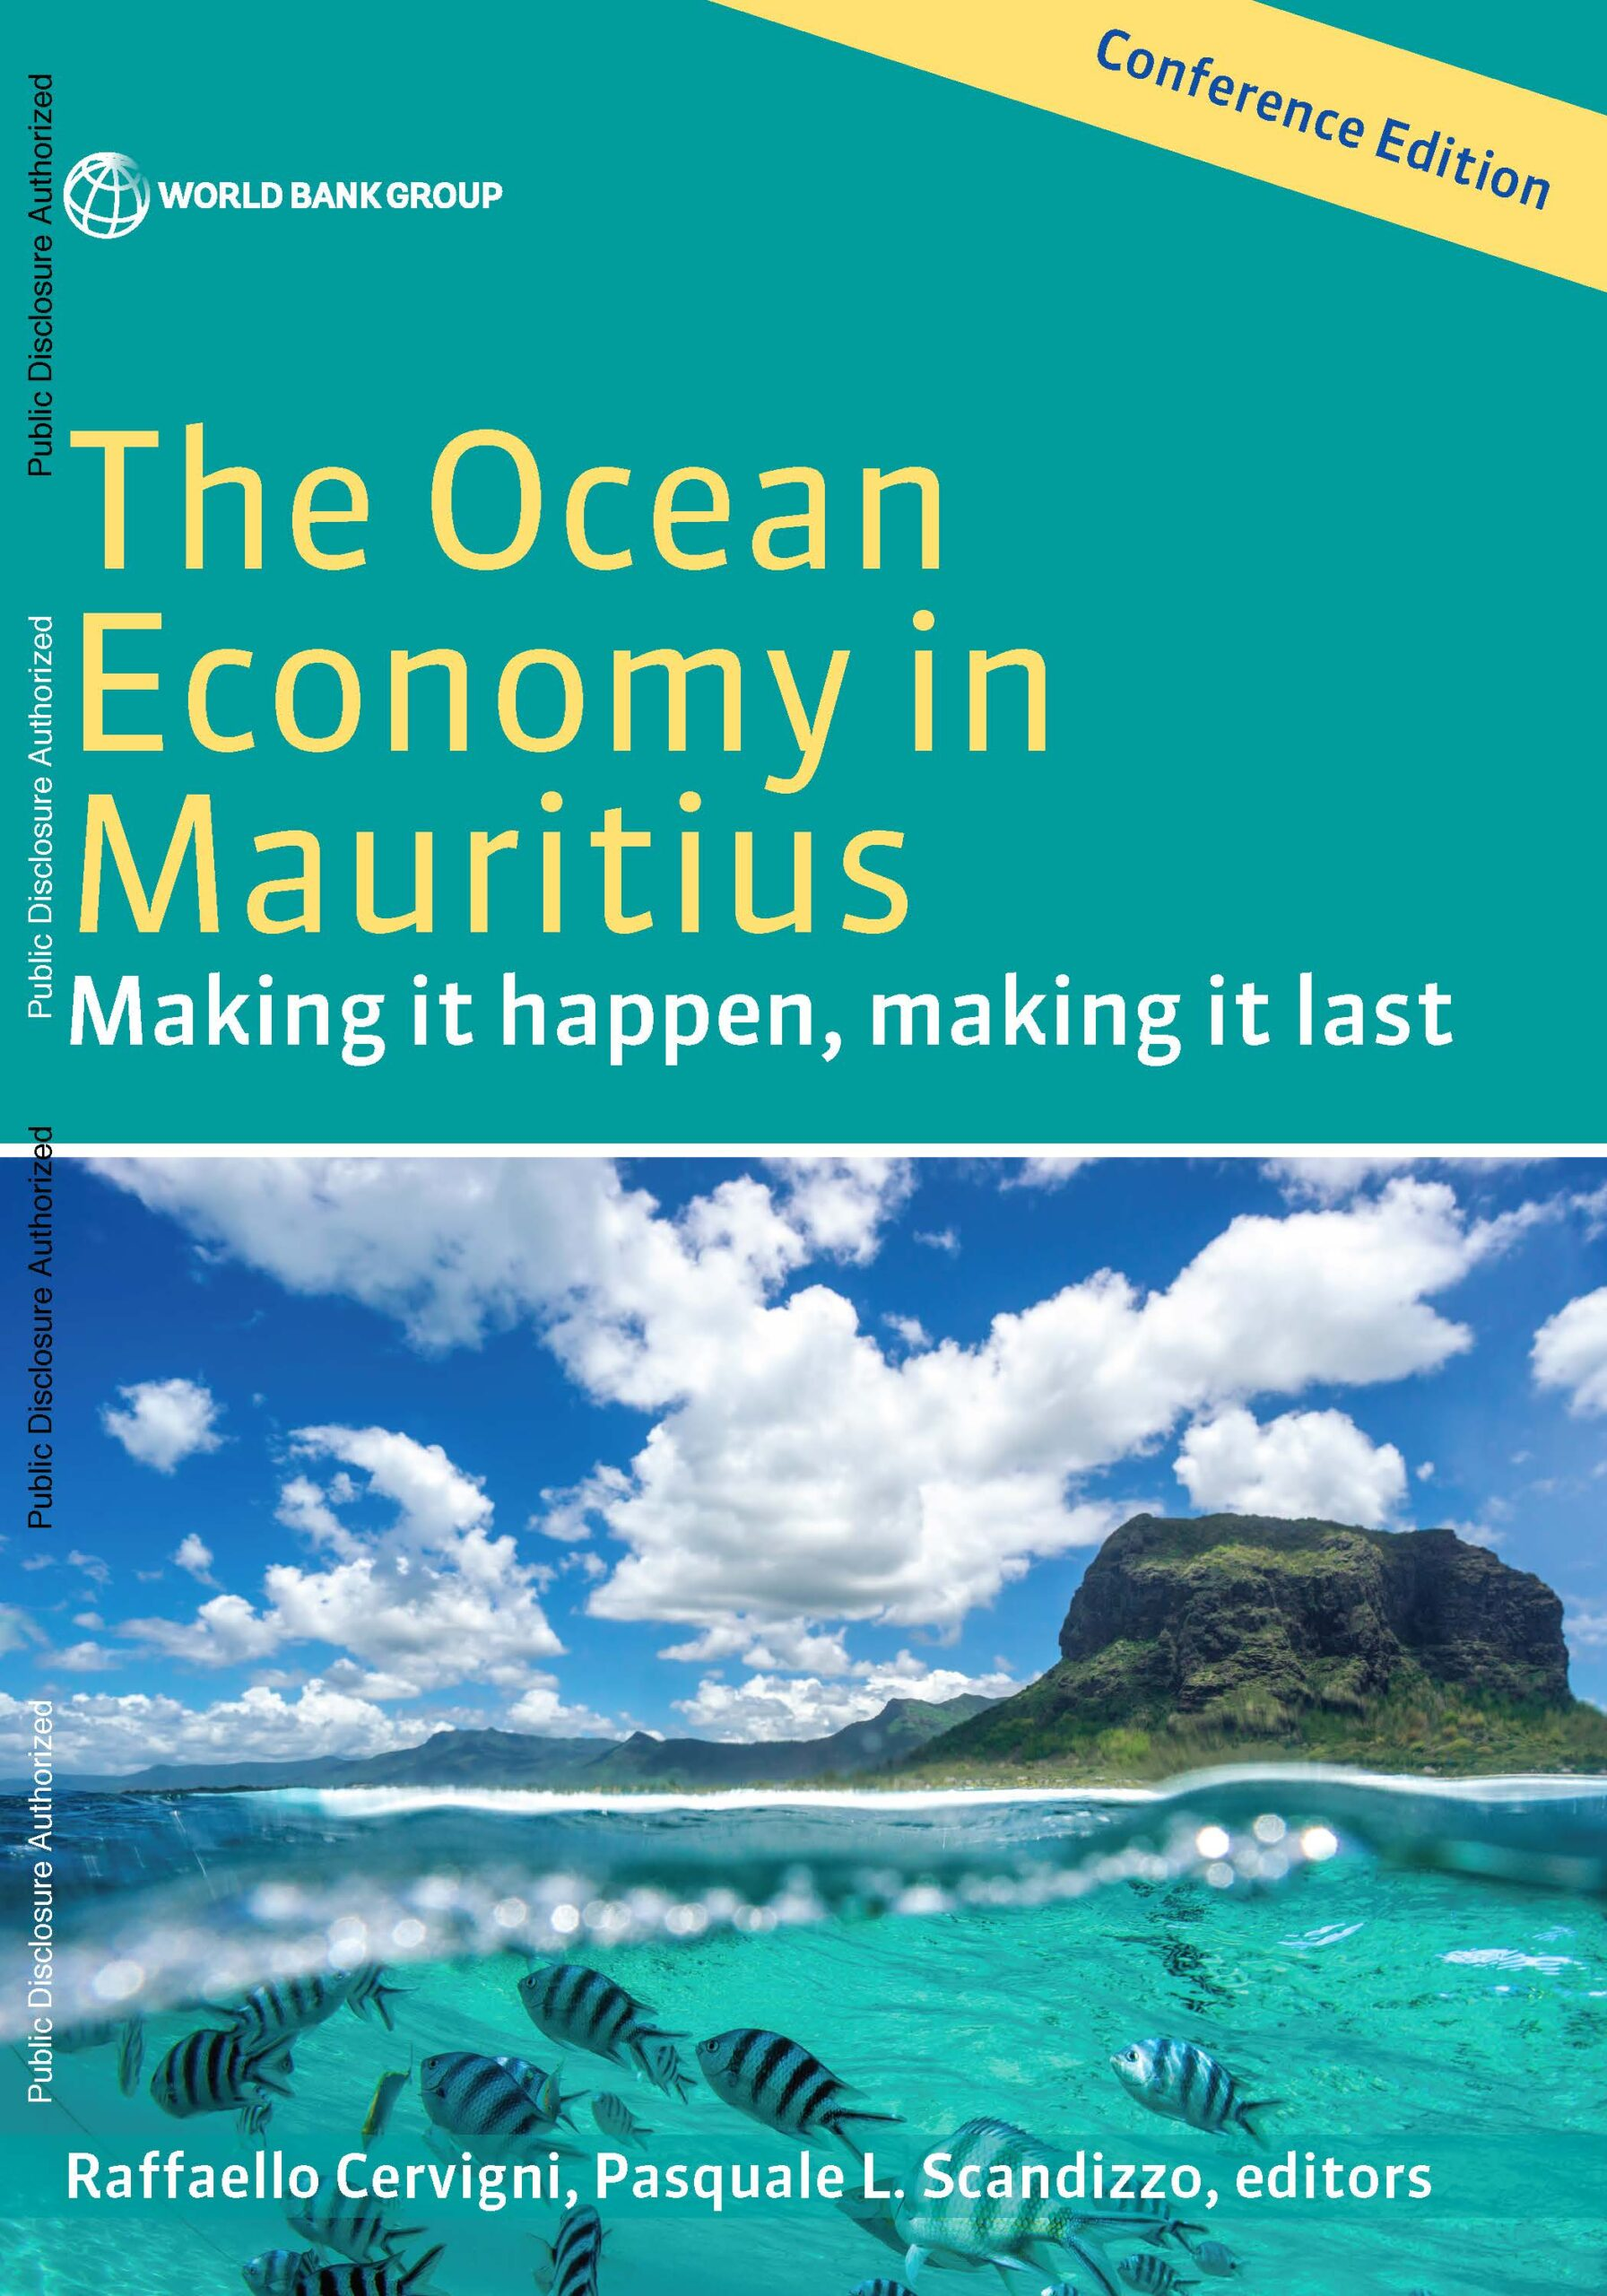 The Ocean Economy in Mauritius: Making it happen, making it last